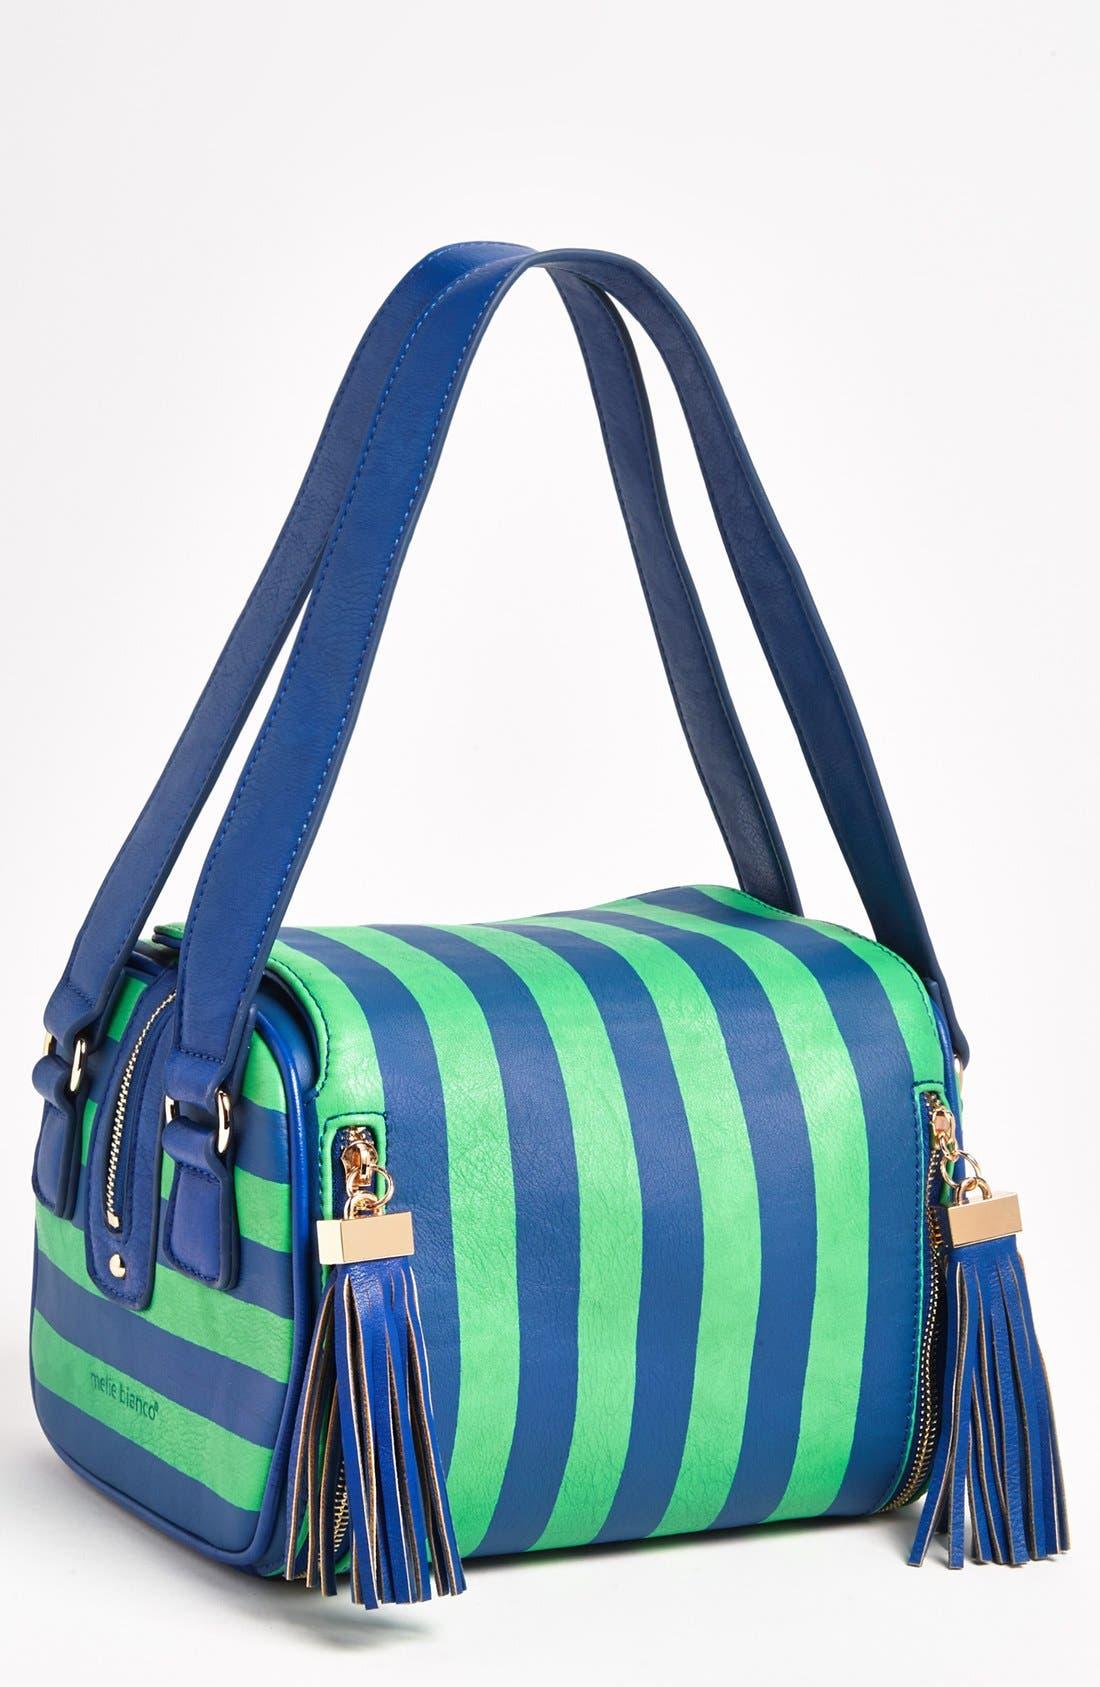 Alternate Image 1 Selected - Melie Bianco 'Mandy' Cube Handbag